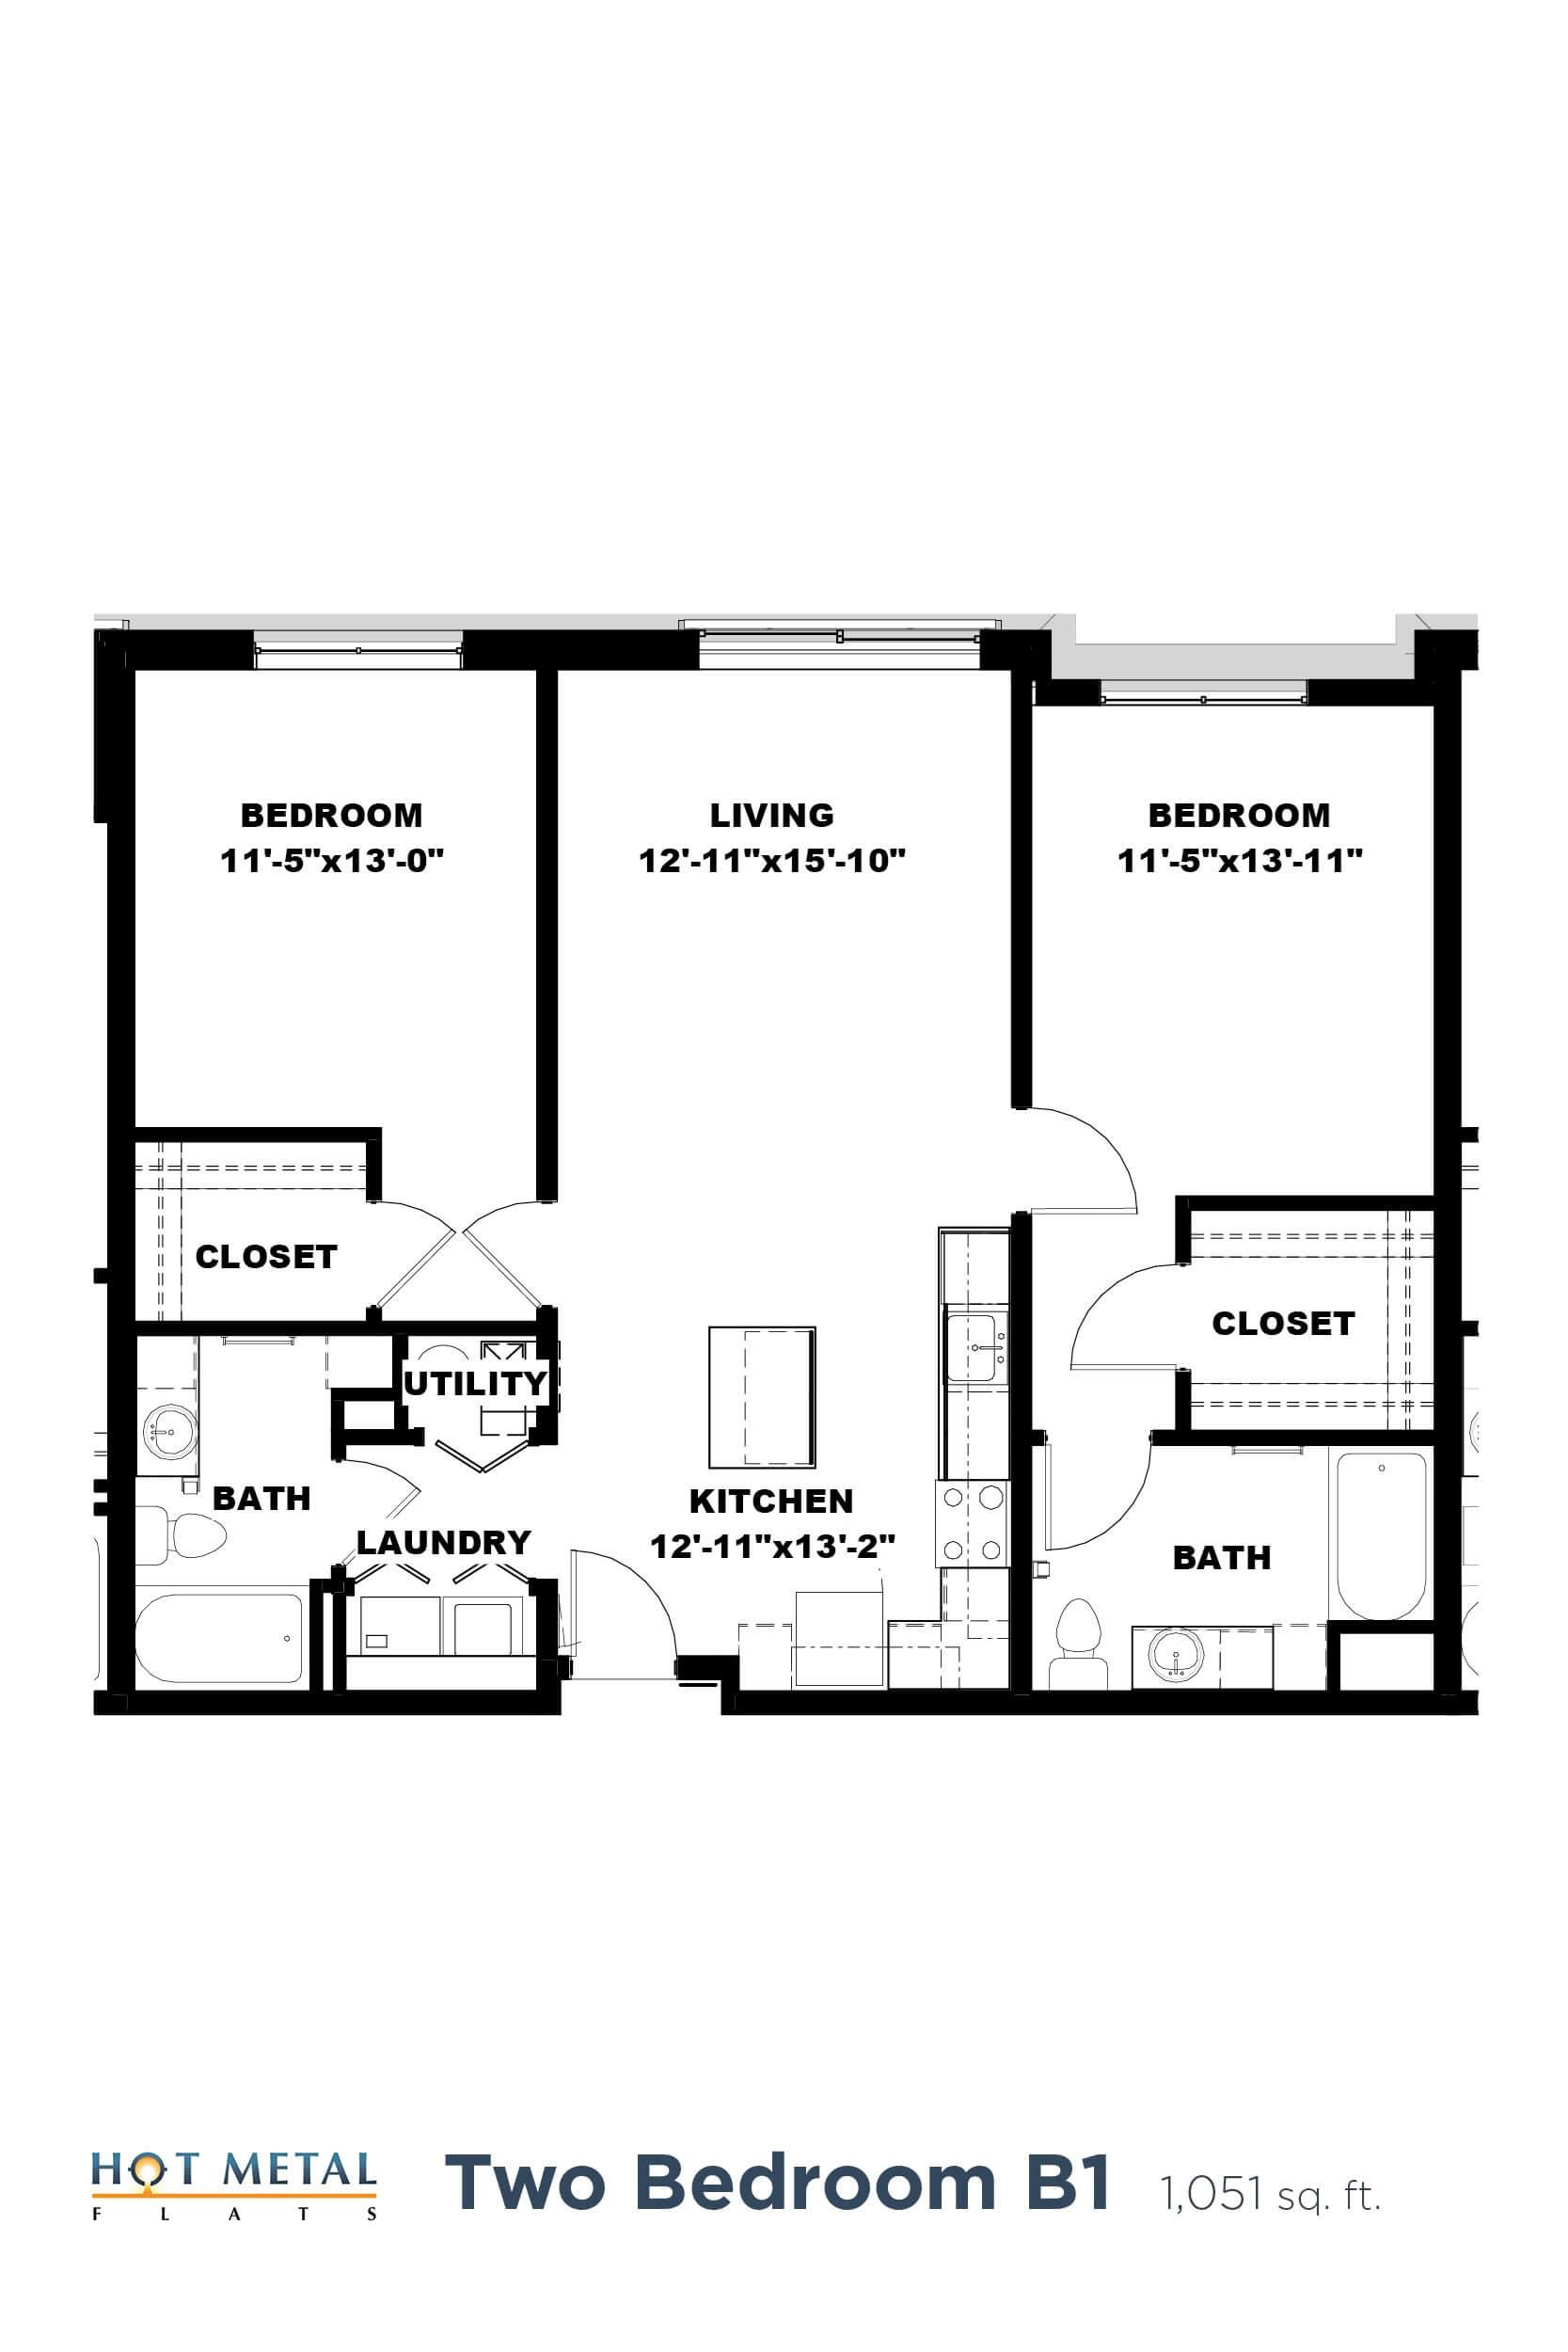 Floor Plan  Hot Metal Flats B1 Floorplan, Hot Metal Flats apartments, Pittsburgh, PA, opens a dialog